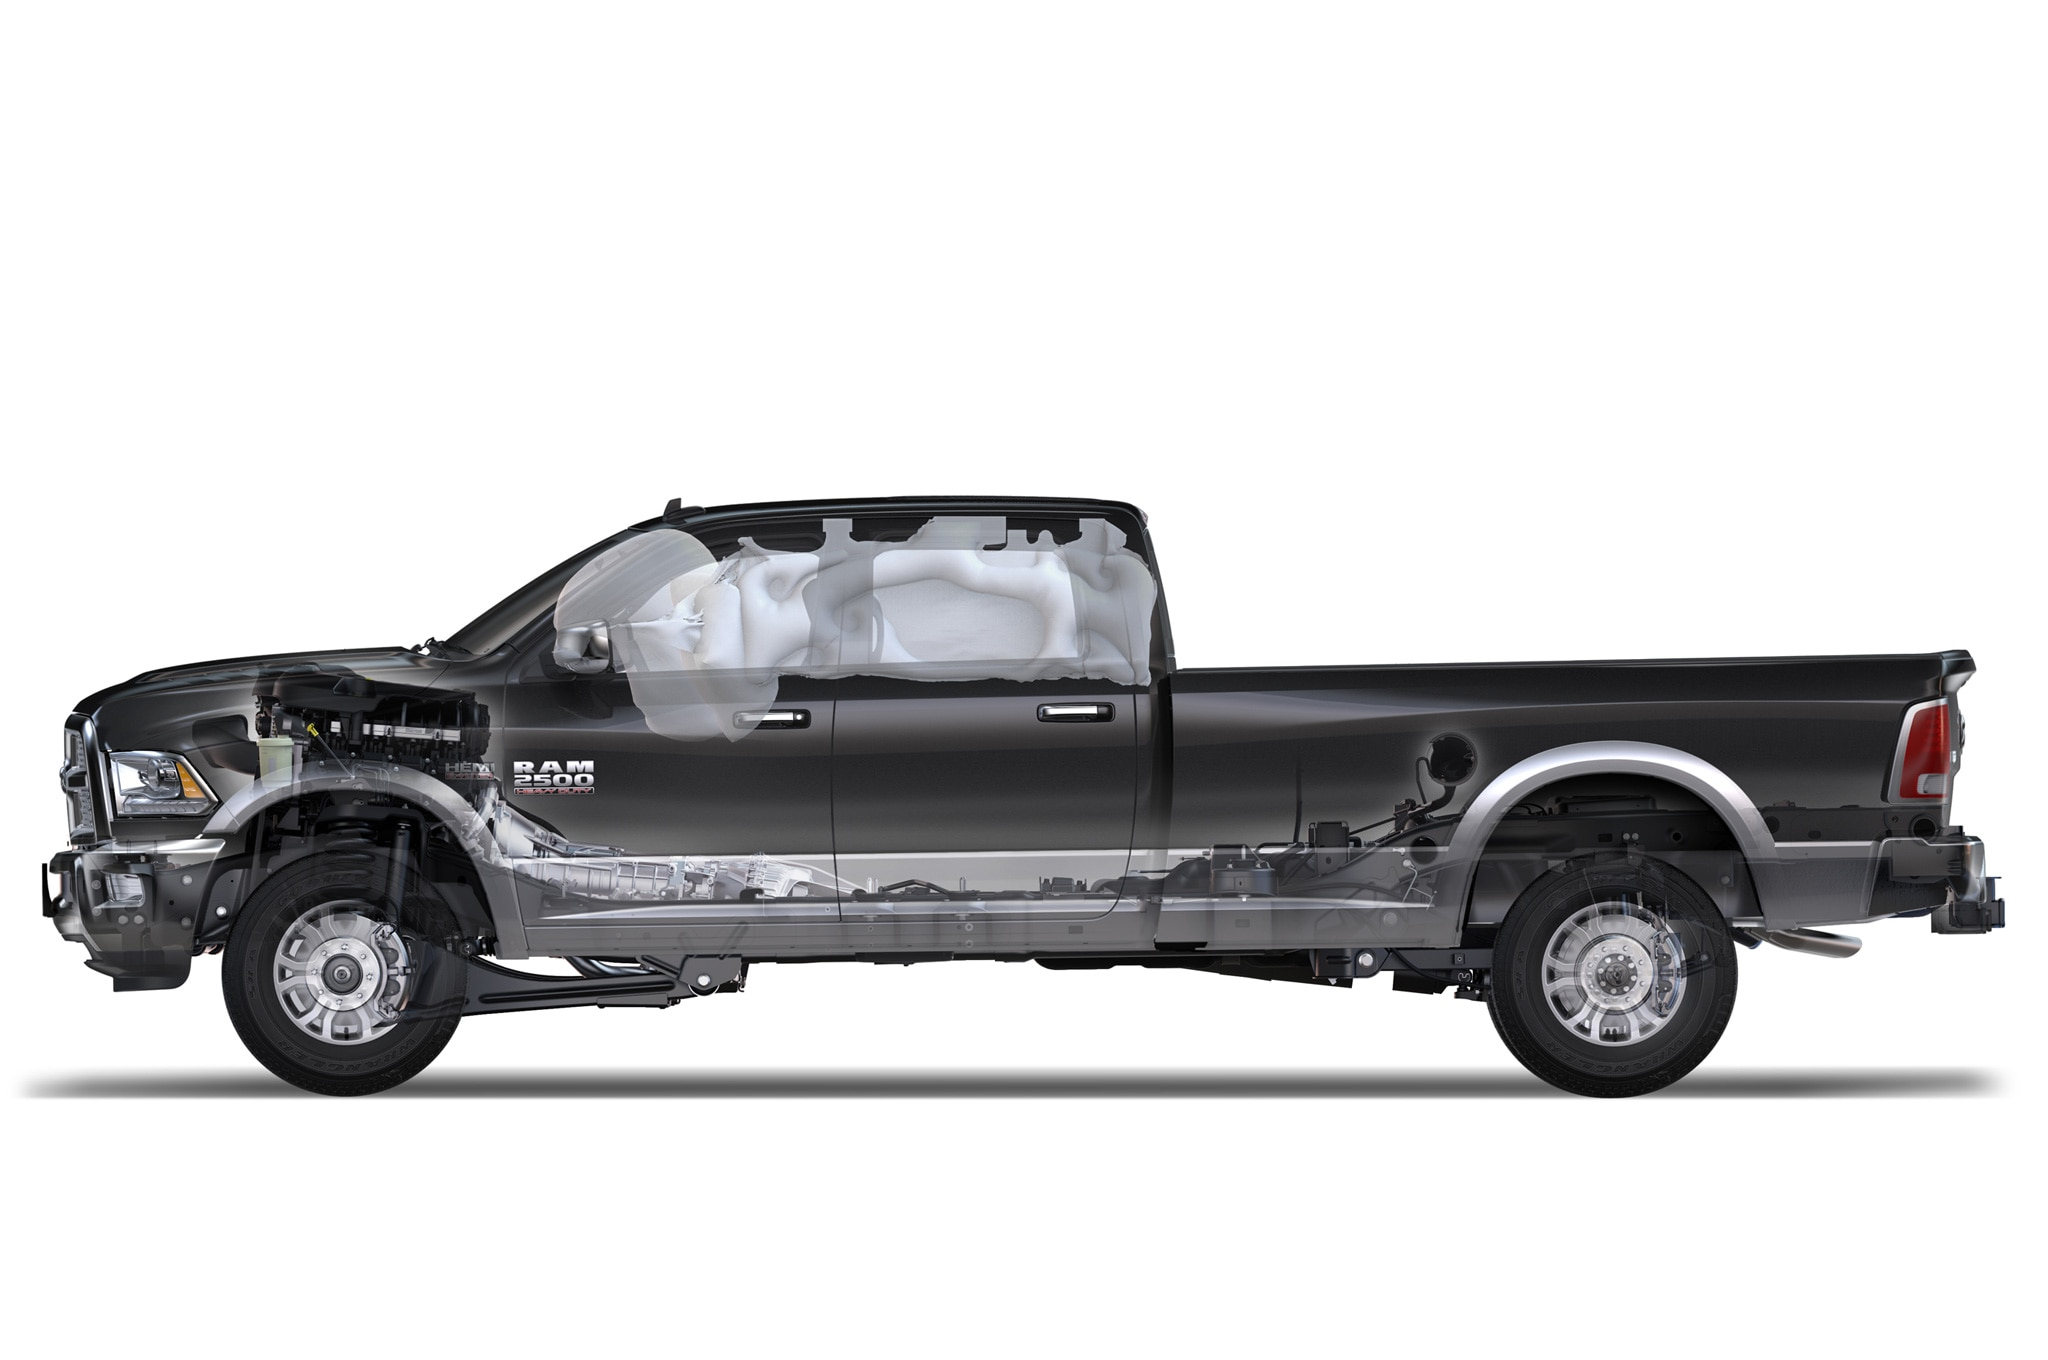 2014 ram heavy duty gets gassy 2500 gets rear coils. Black Bedroom Furniture Sets. Home Design Ideas